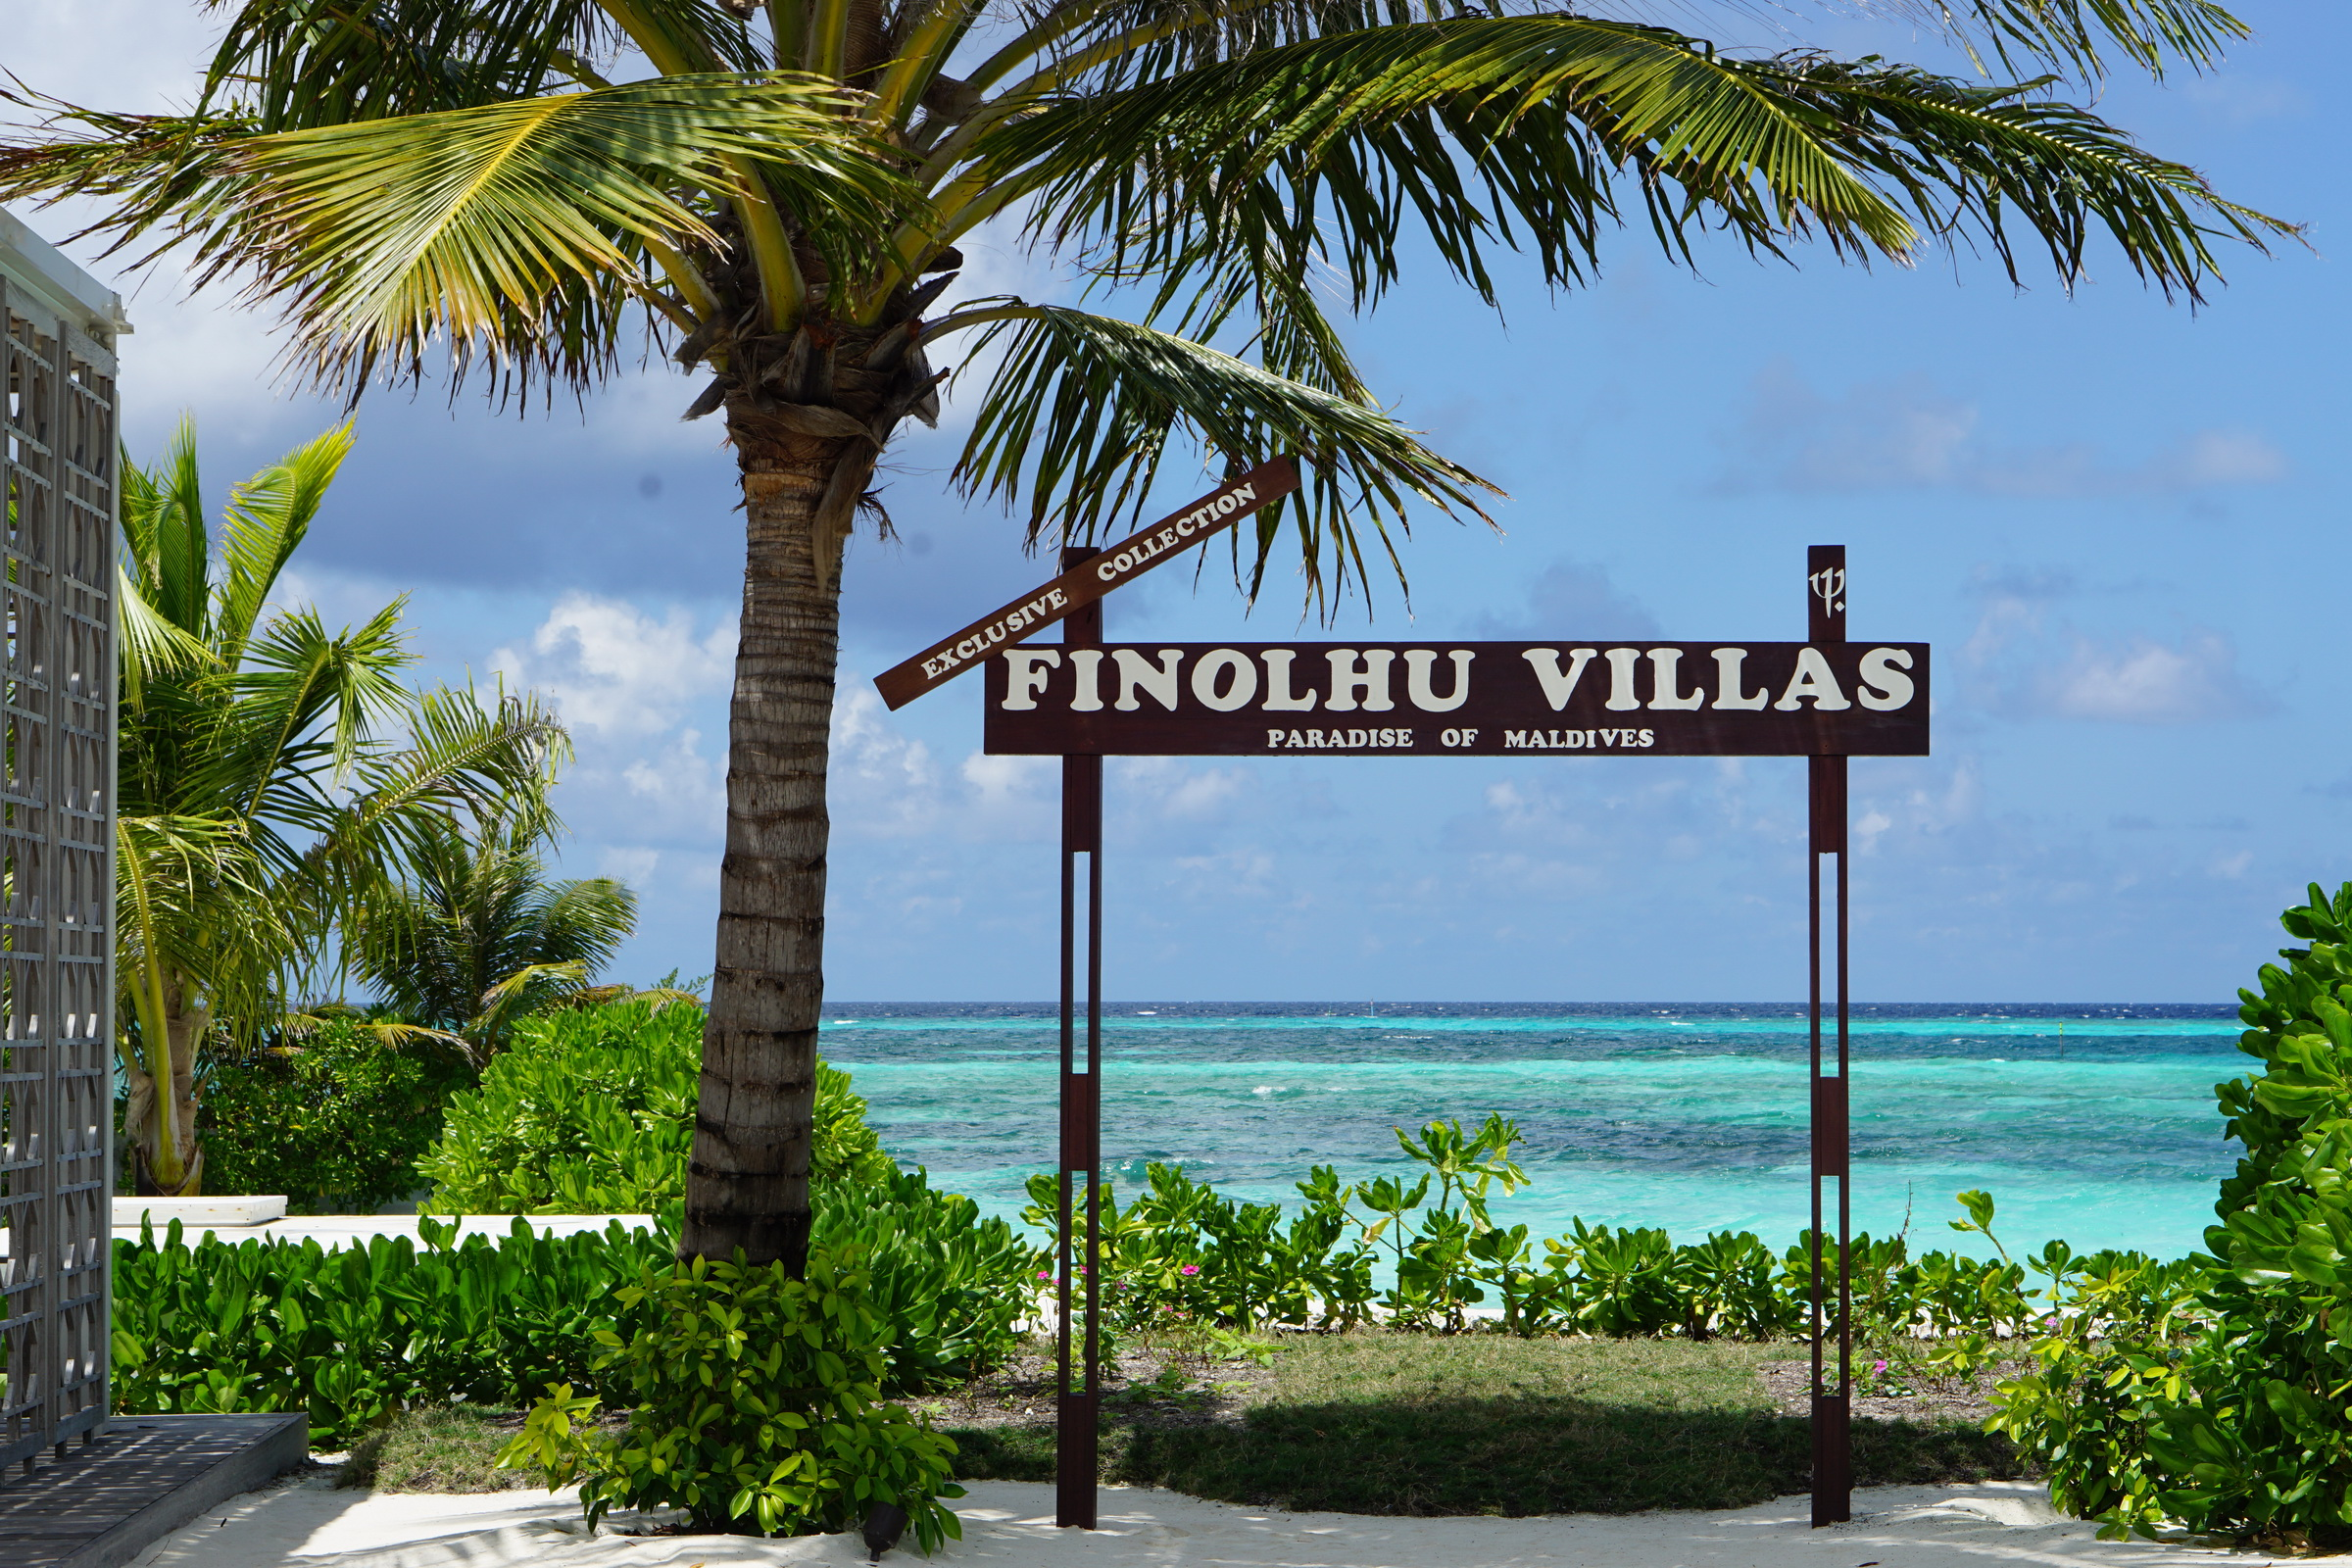 Club Med Finolhu Villas, Maldives 3วัน 2 คืน บินแอร์เอเชีย